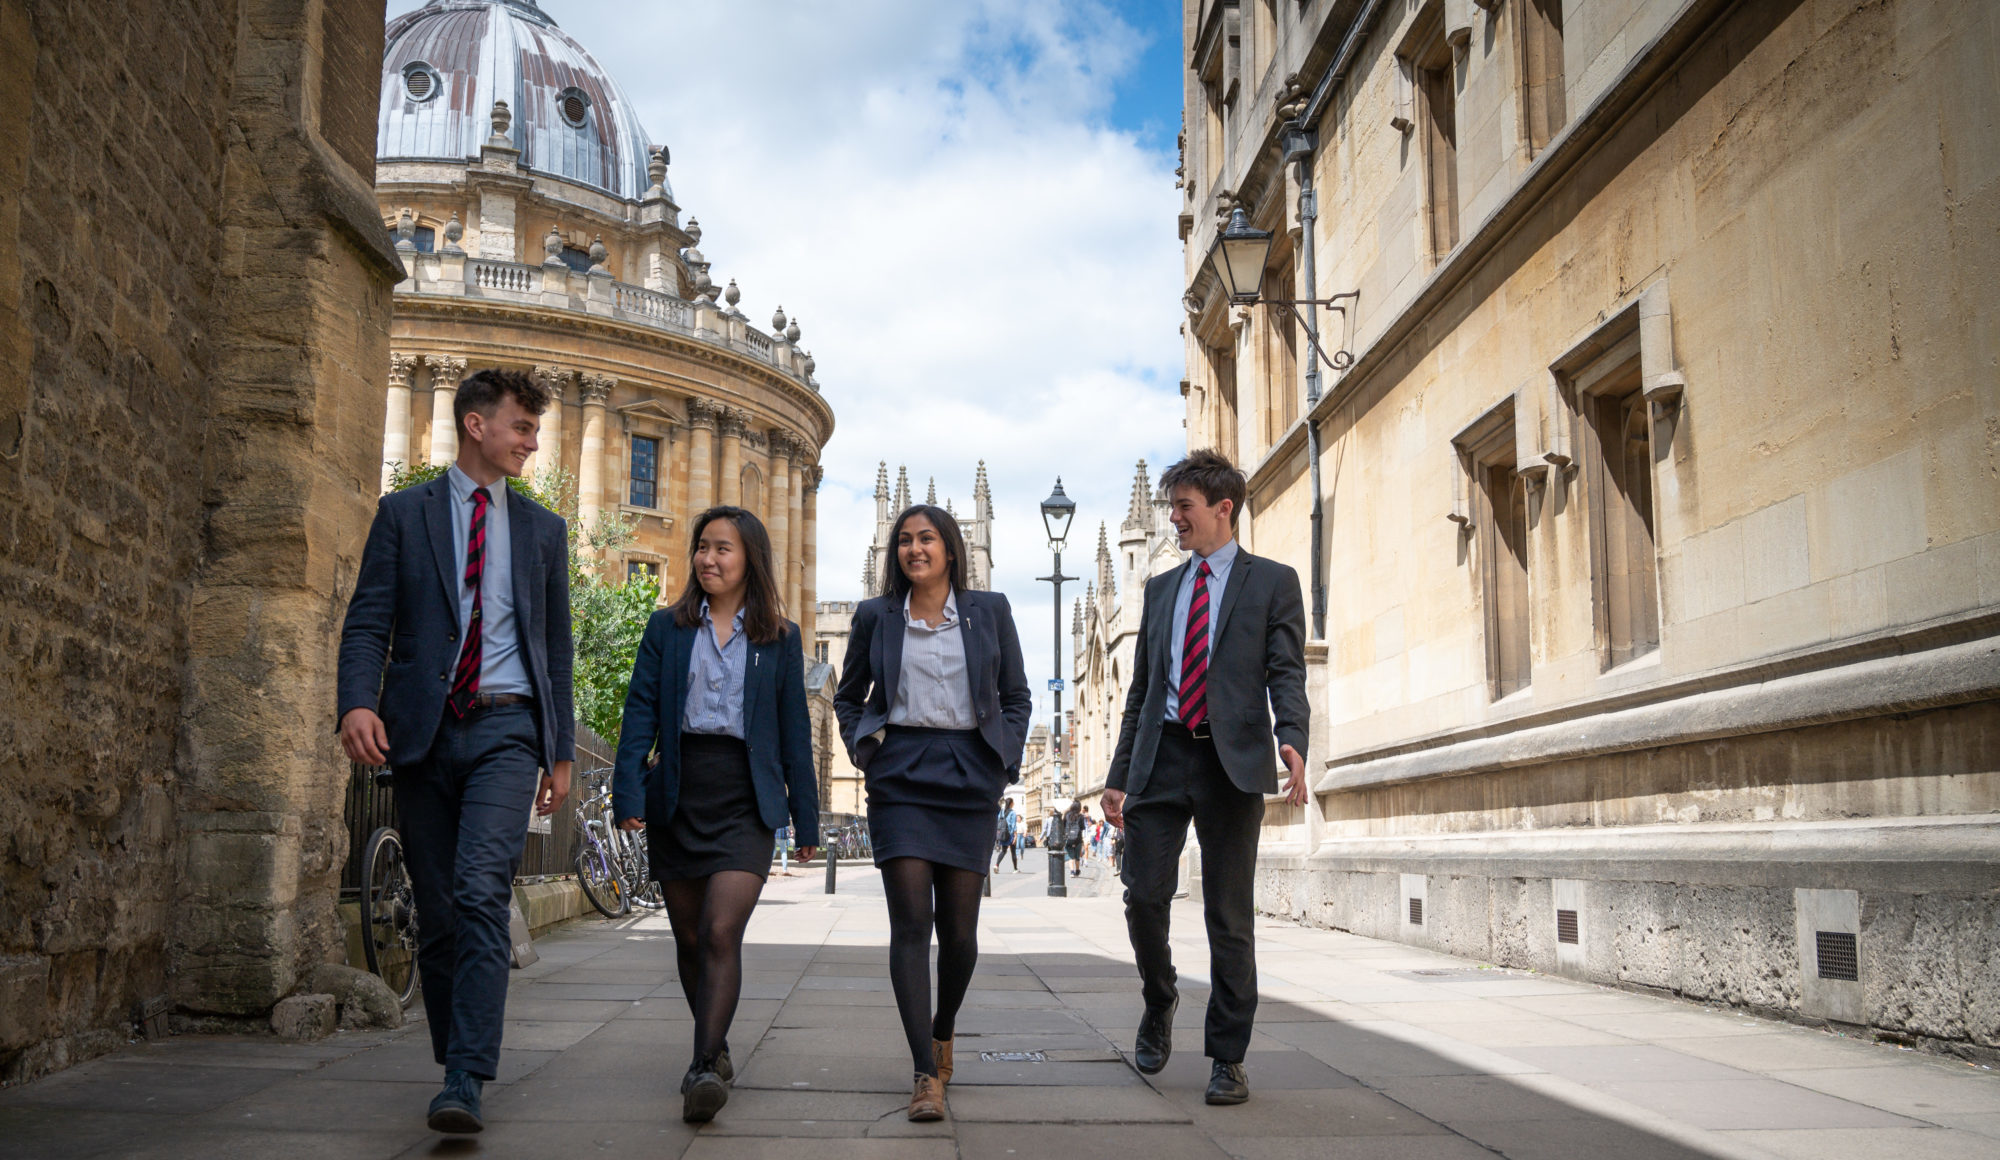 Magdalen College School Sixth Form pupils walking through Oxford in uniform